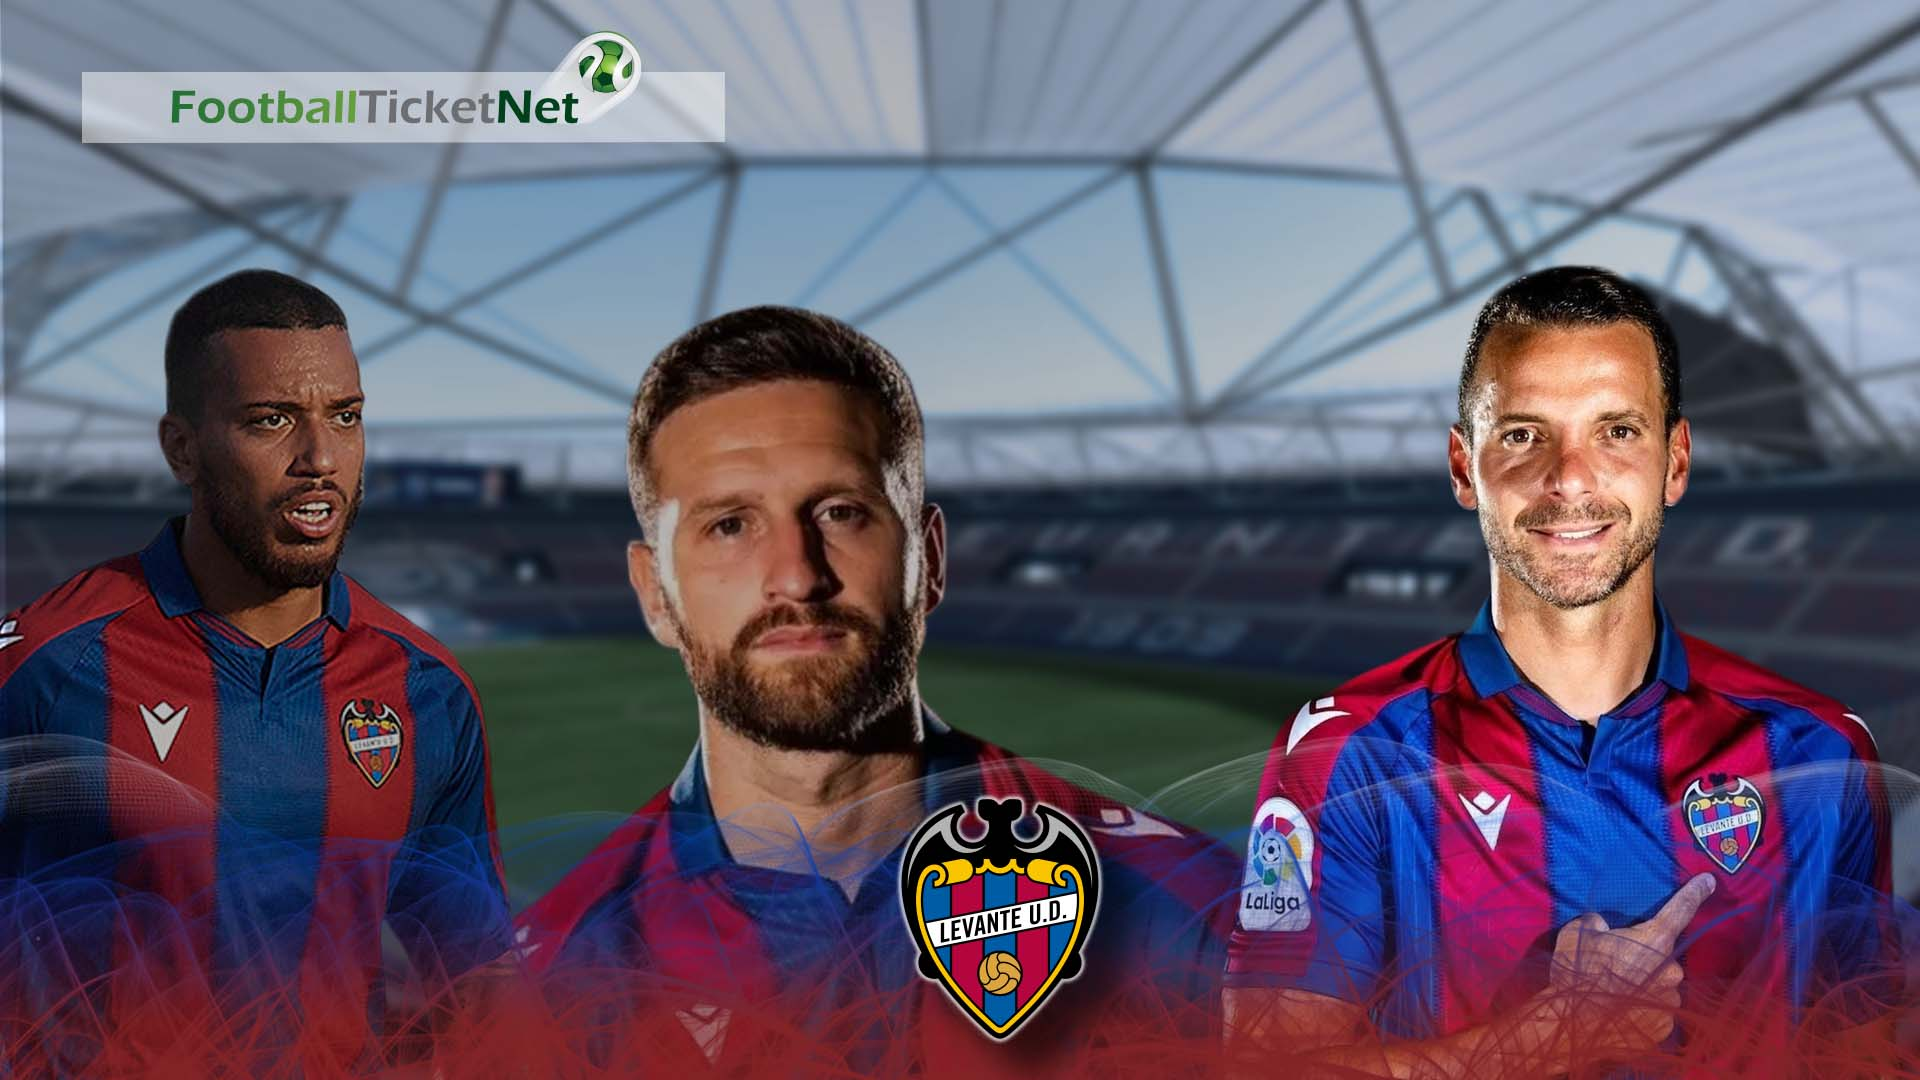 Buy Levante UD Football Tickets 2019/20 | Football Ticket Net